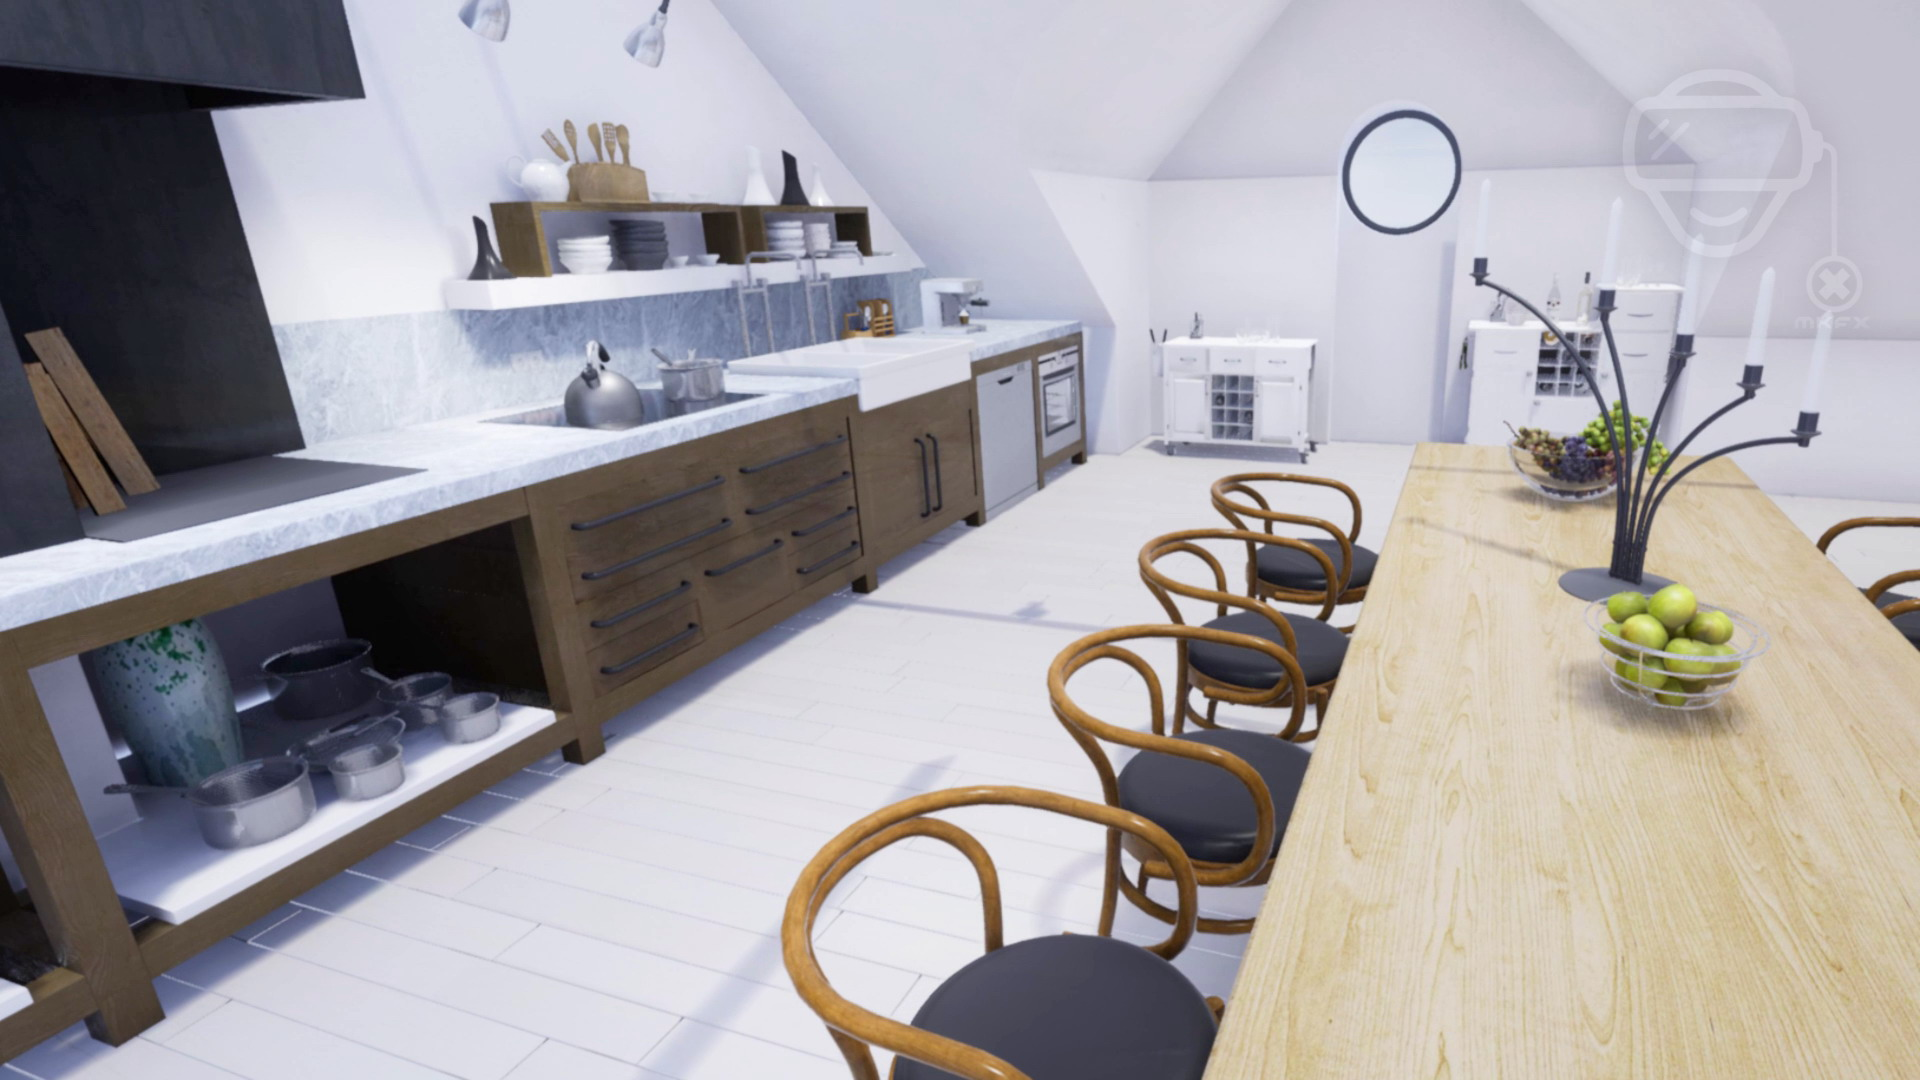 Architektur Wohnung Präsentation MKFX Virtual Reality Experience